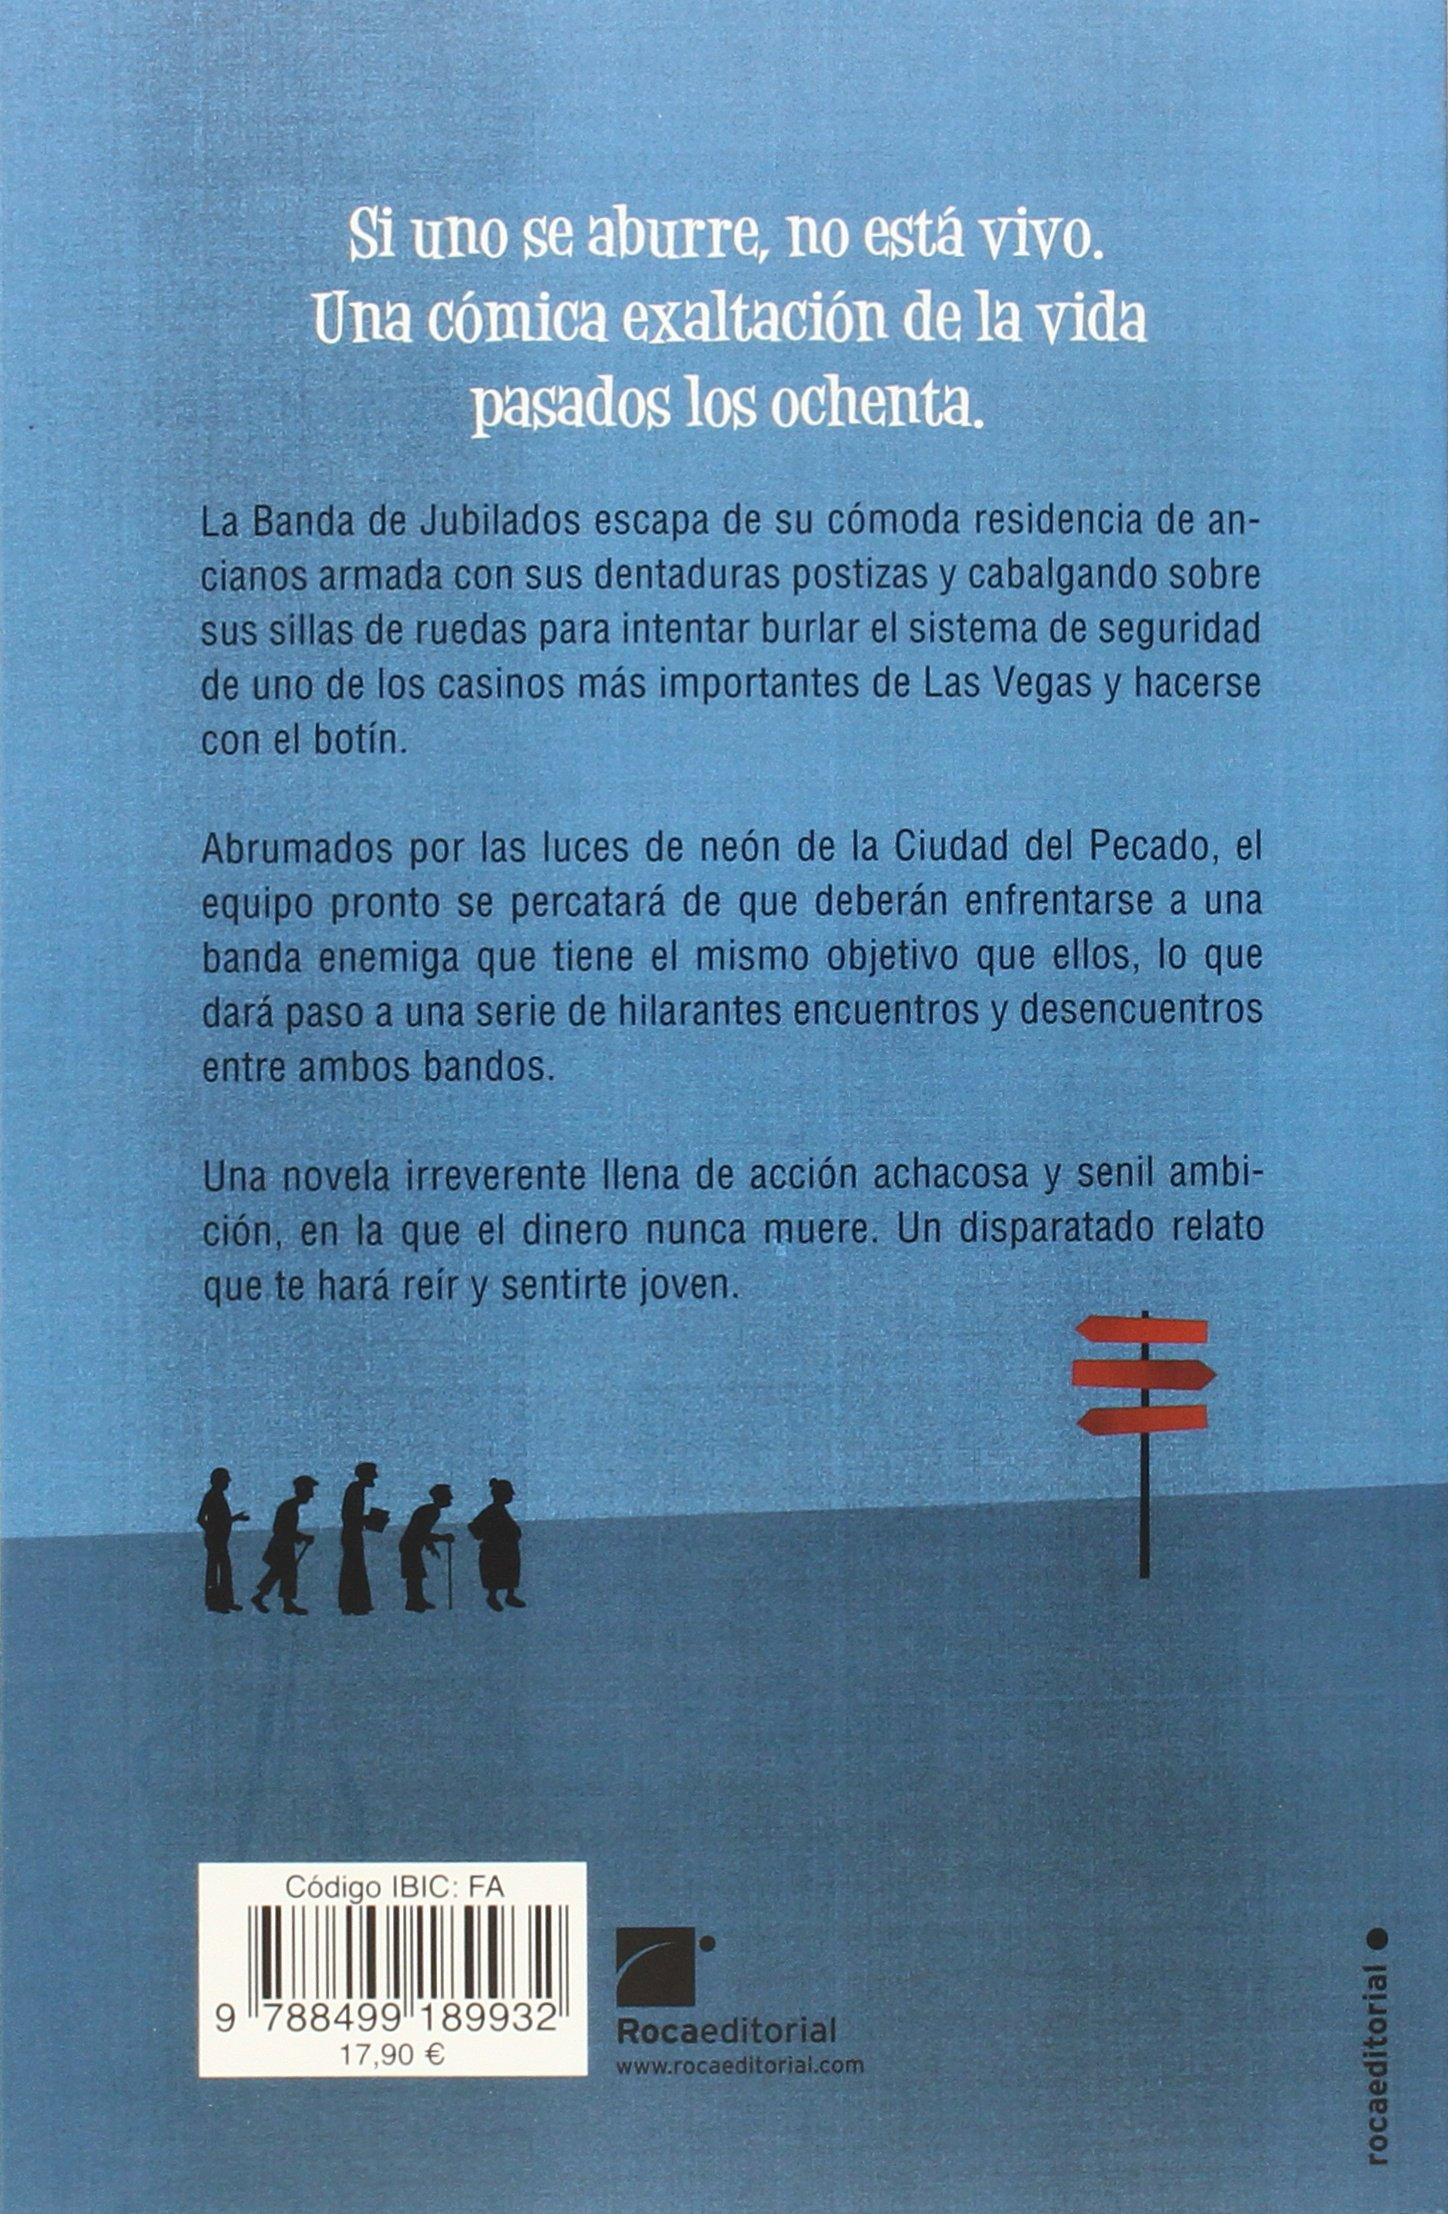 La banda de jubilados que canto dos veces bingo (Spanish Edition): Catharina Ingelman Sunfberg: 9788499189932: Amazon.com: Books